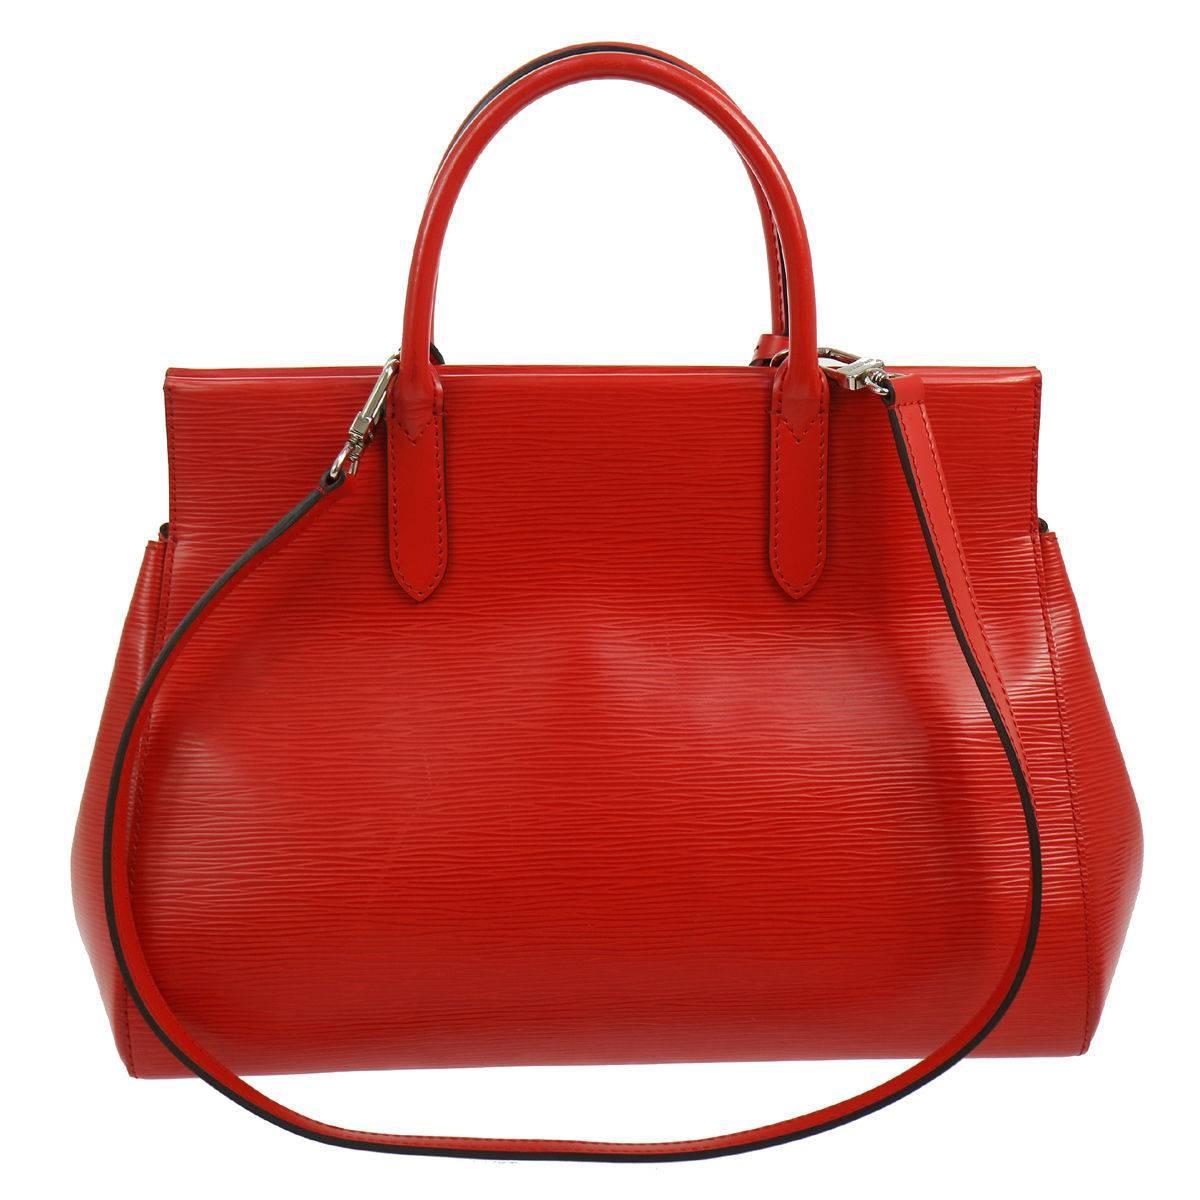 1stdibs Goyard Red Monogram Large Bucket Carryall Travel Top Handle Shoulder Tote Bag objOAEej